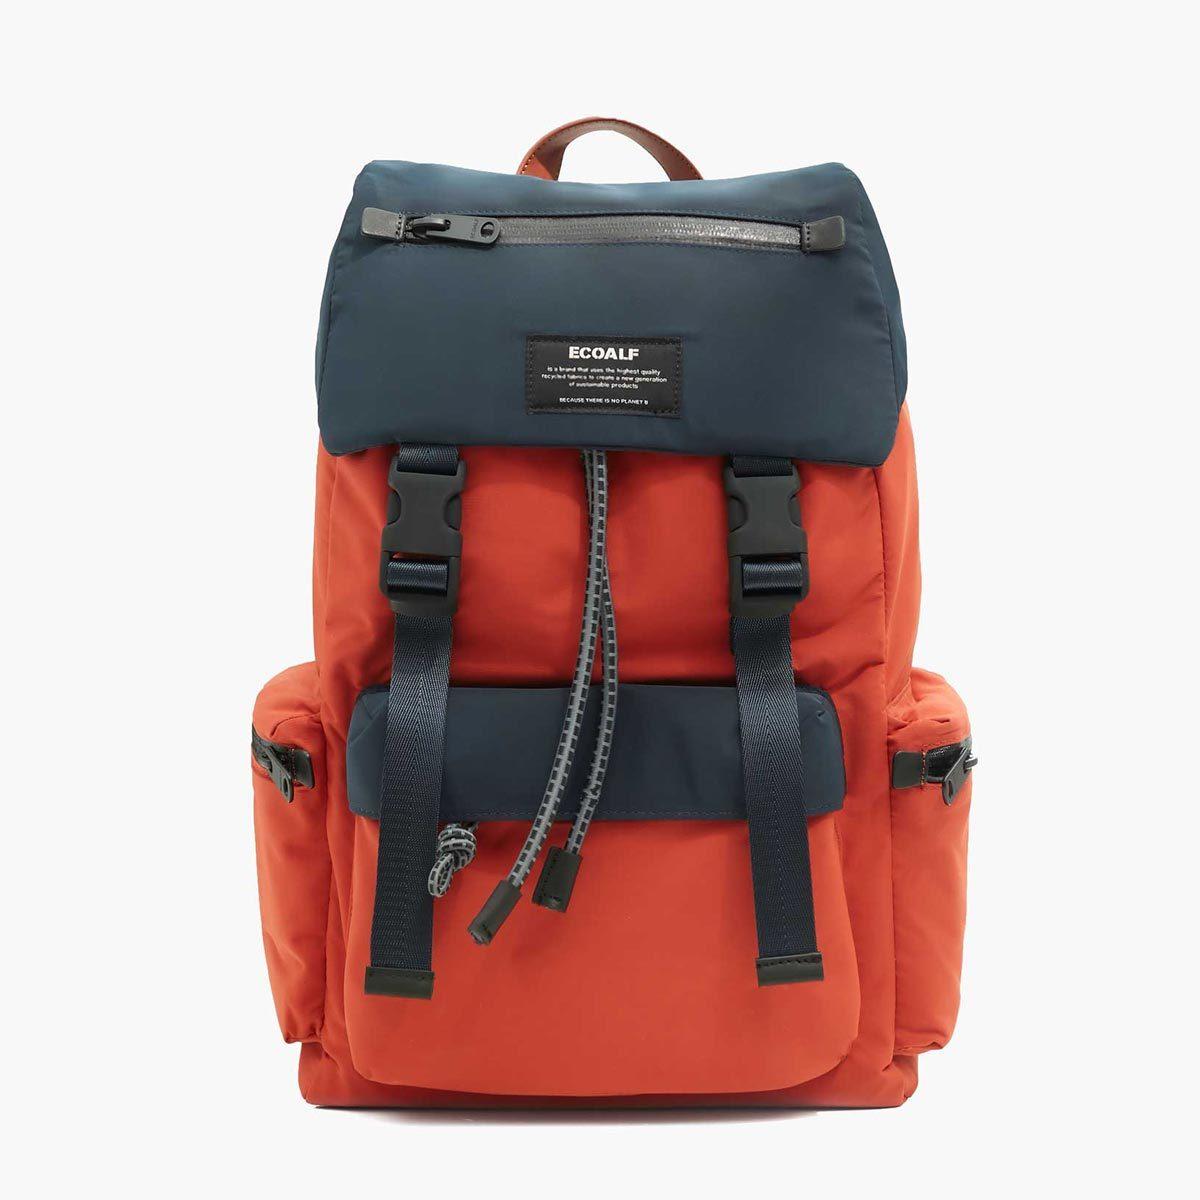 Ecoalf Wild Sherpa Backpack Ryggäsck i återvunnen nylon